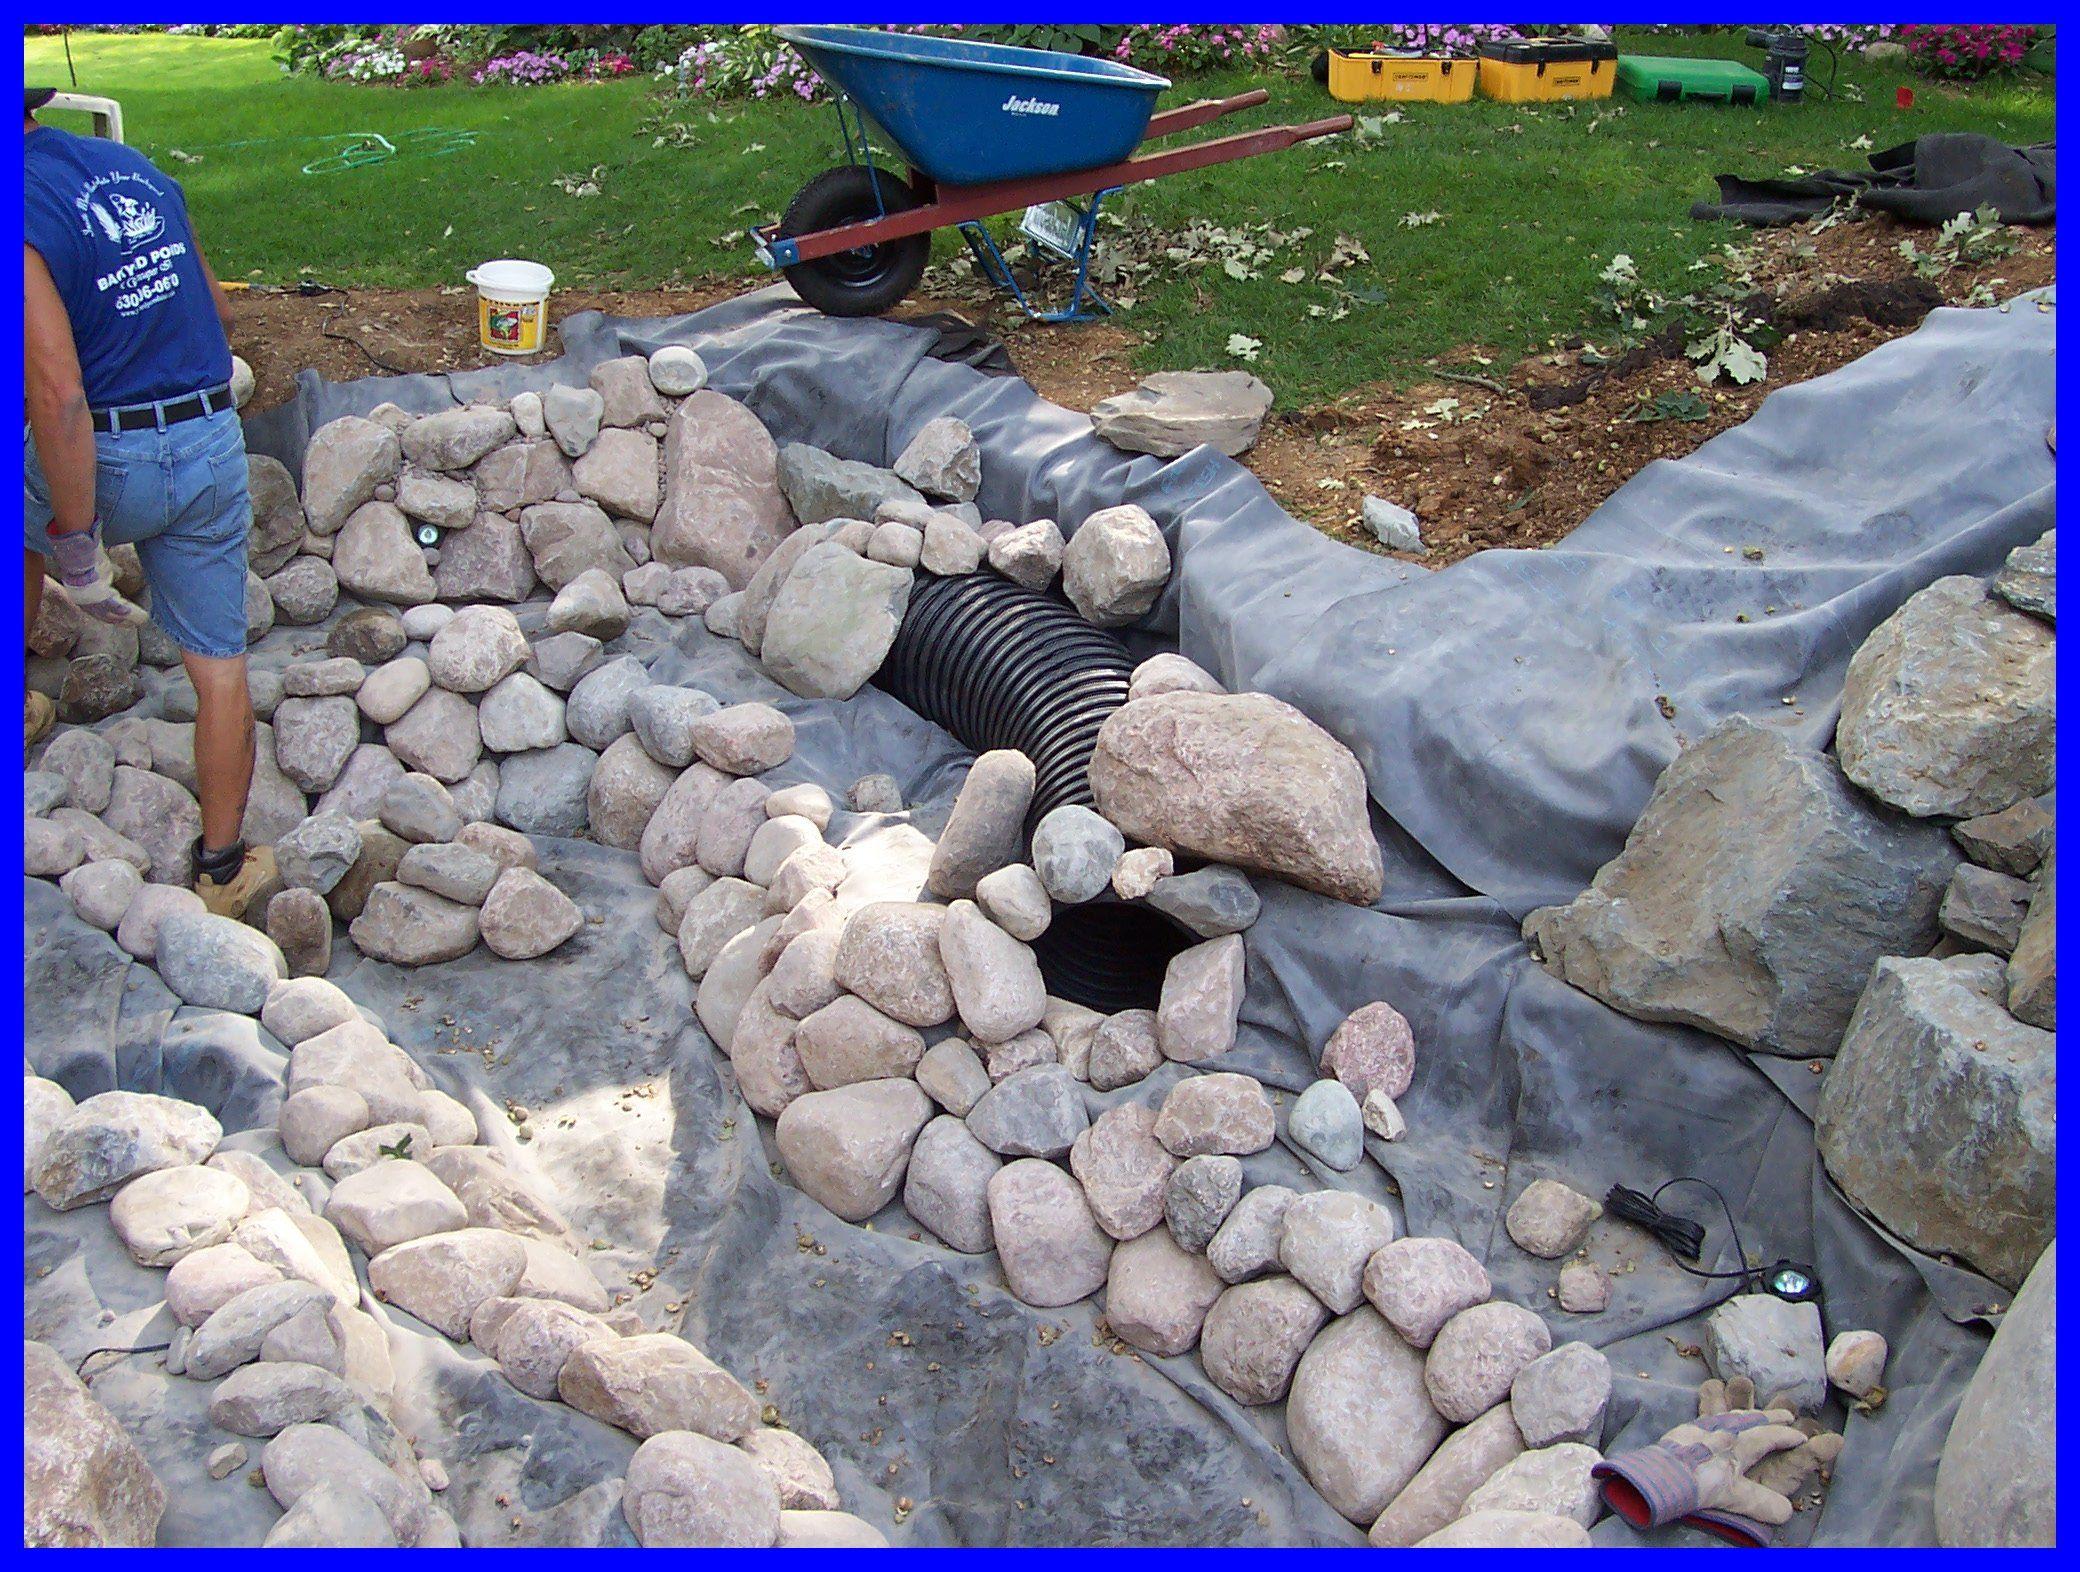 backyard+waterfalls+and+ponds | waterfalls streams 1 ...